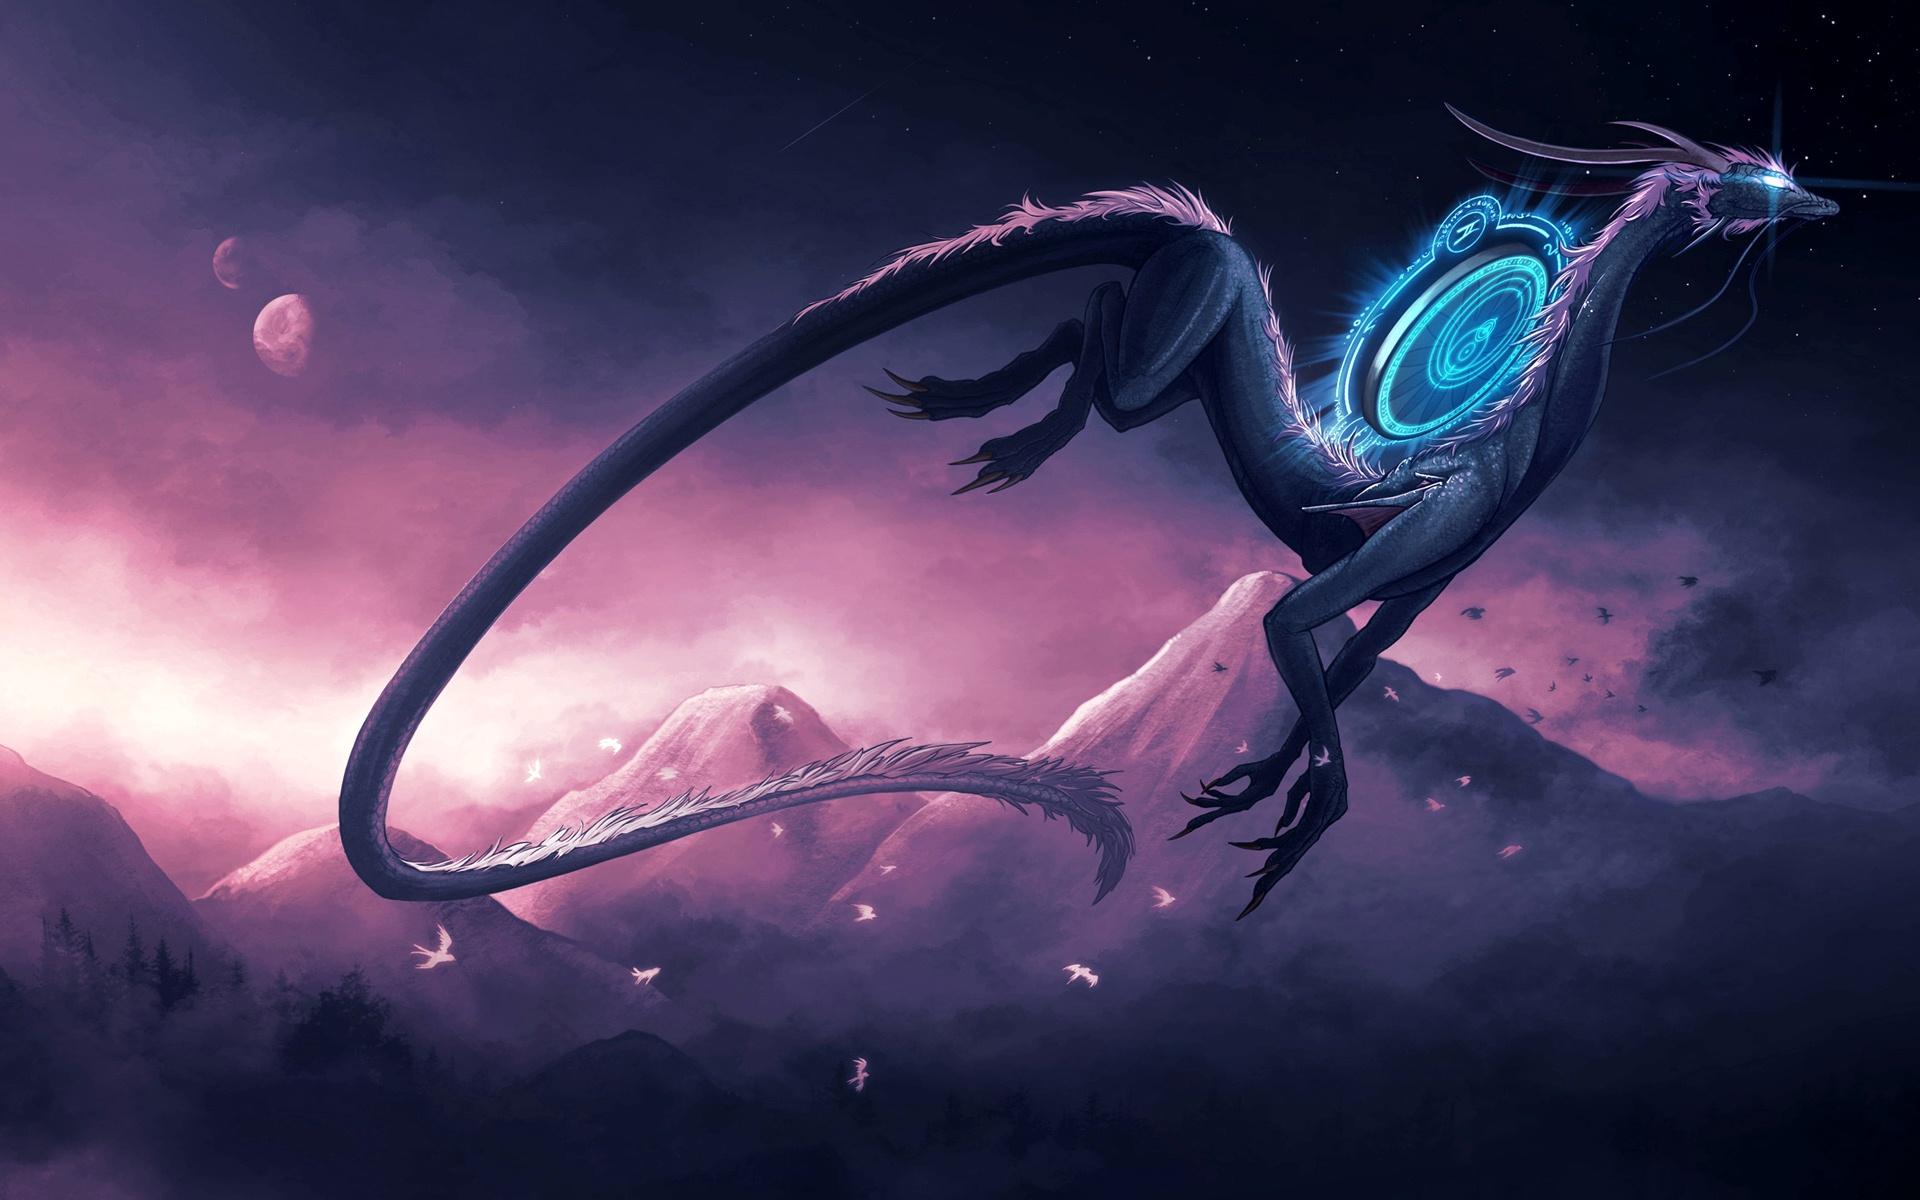 Hd wallpaper dragon - Furious Dragon Wallpapers Hd Wallpapers